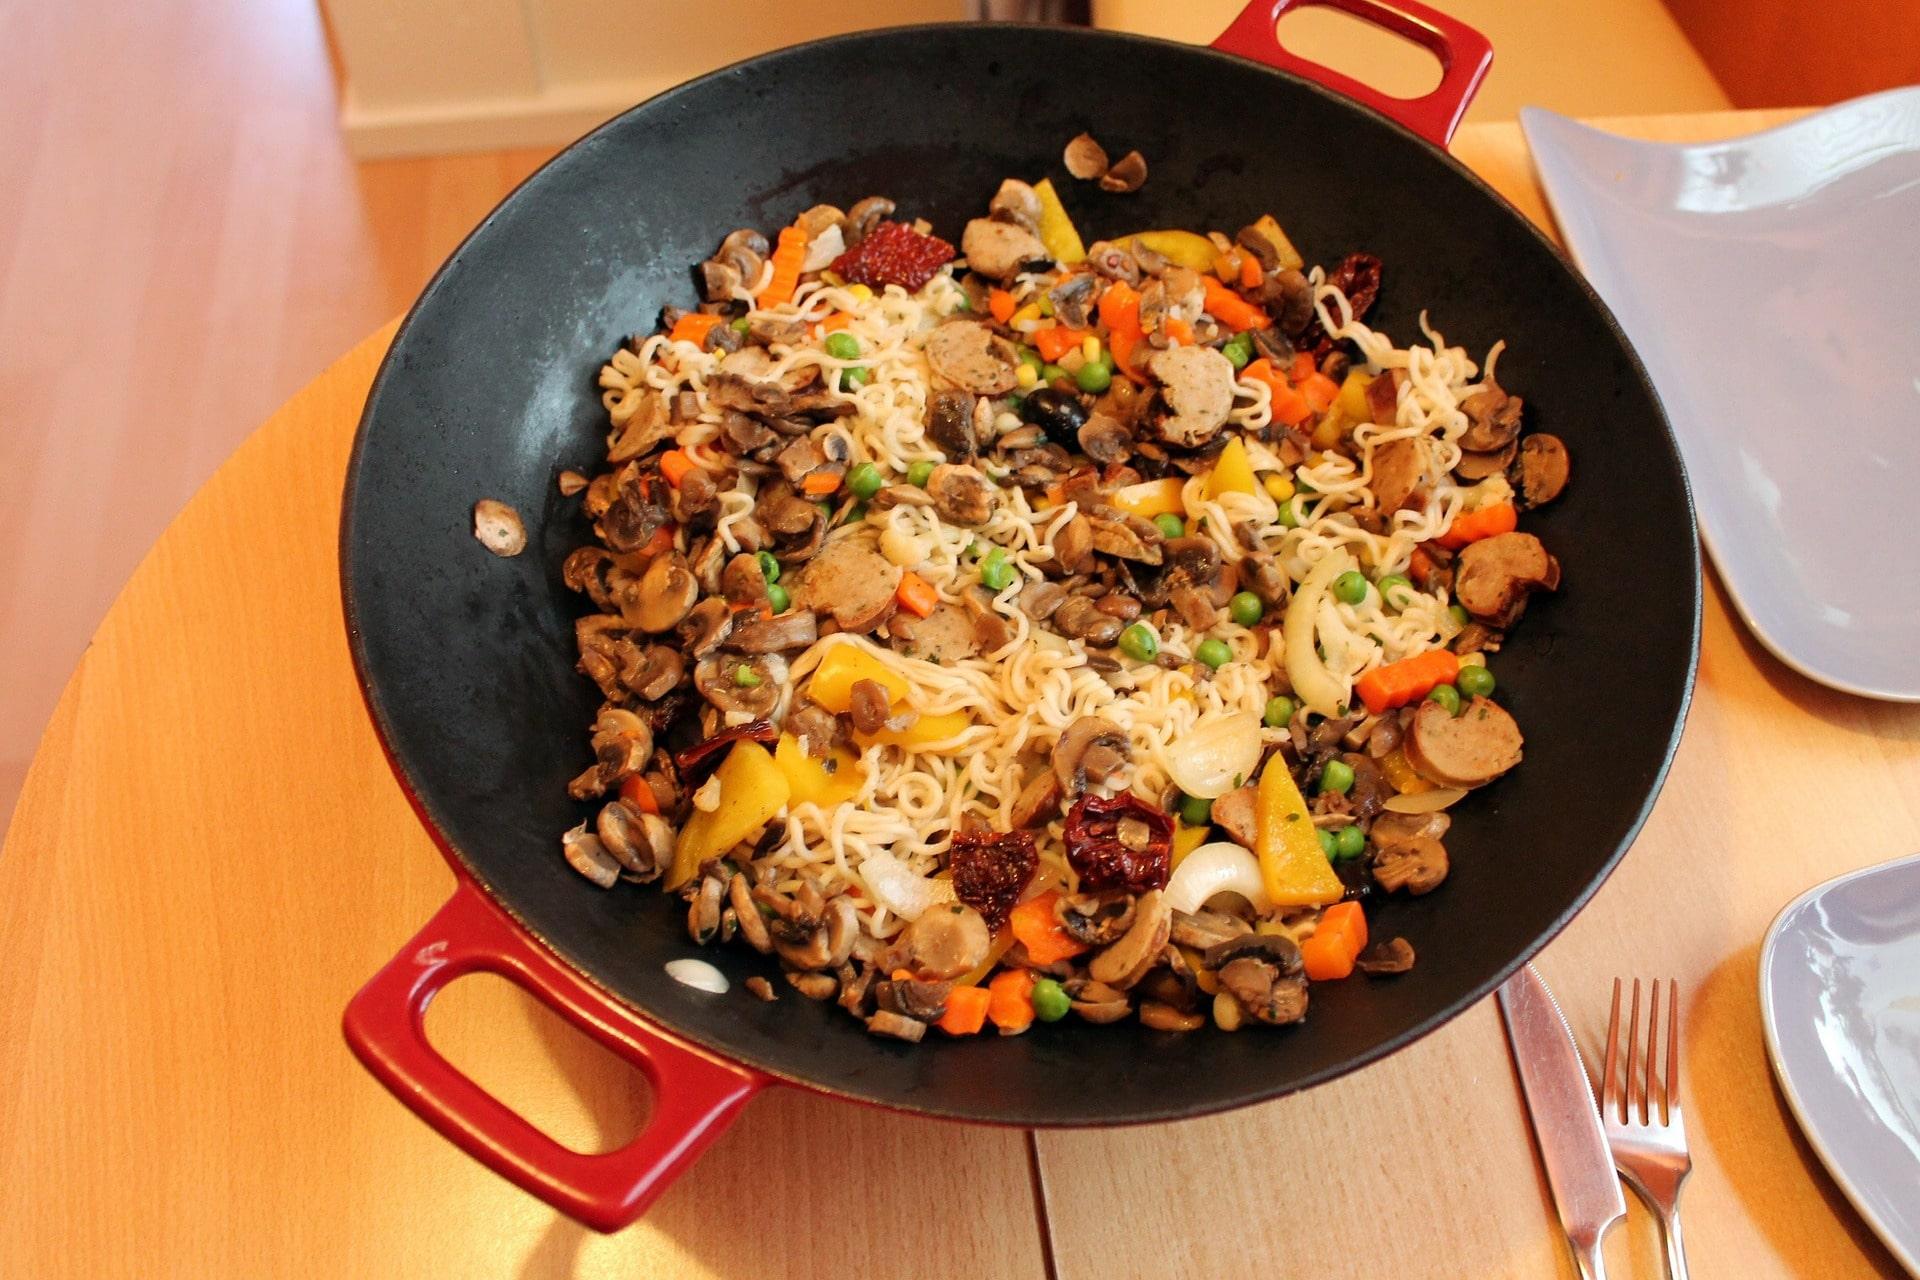 skillet handles, frying pan handles